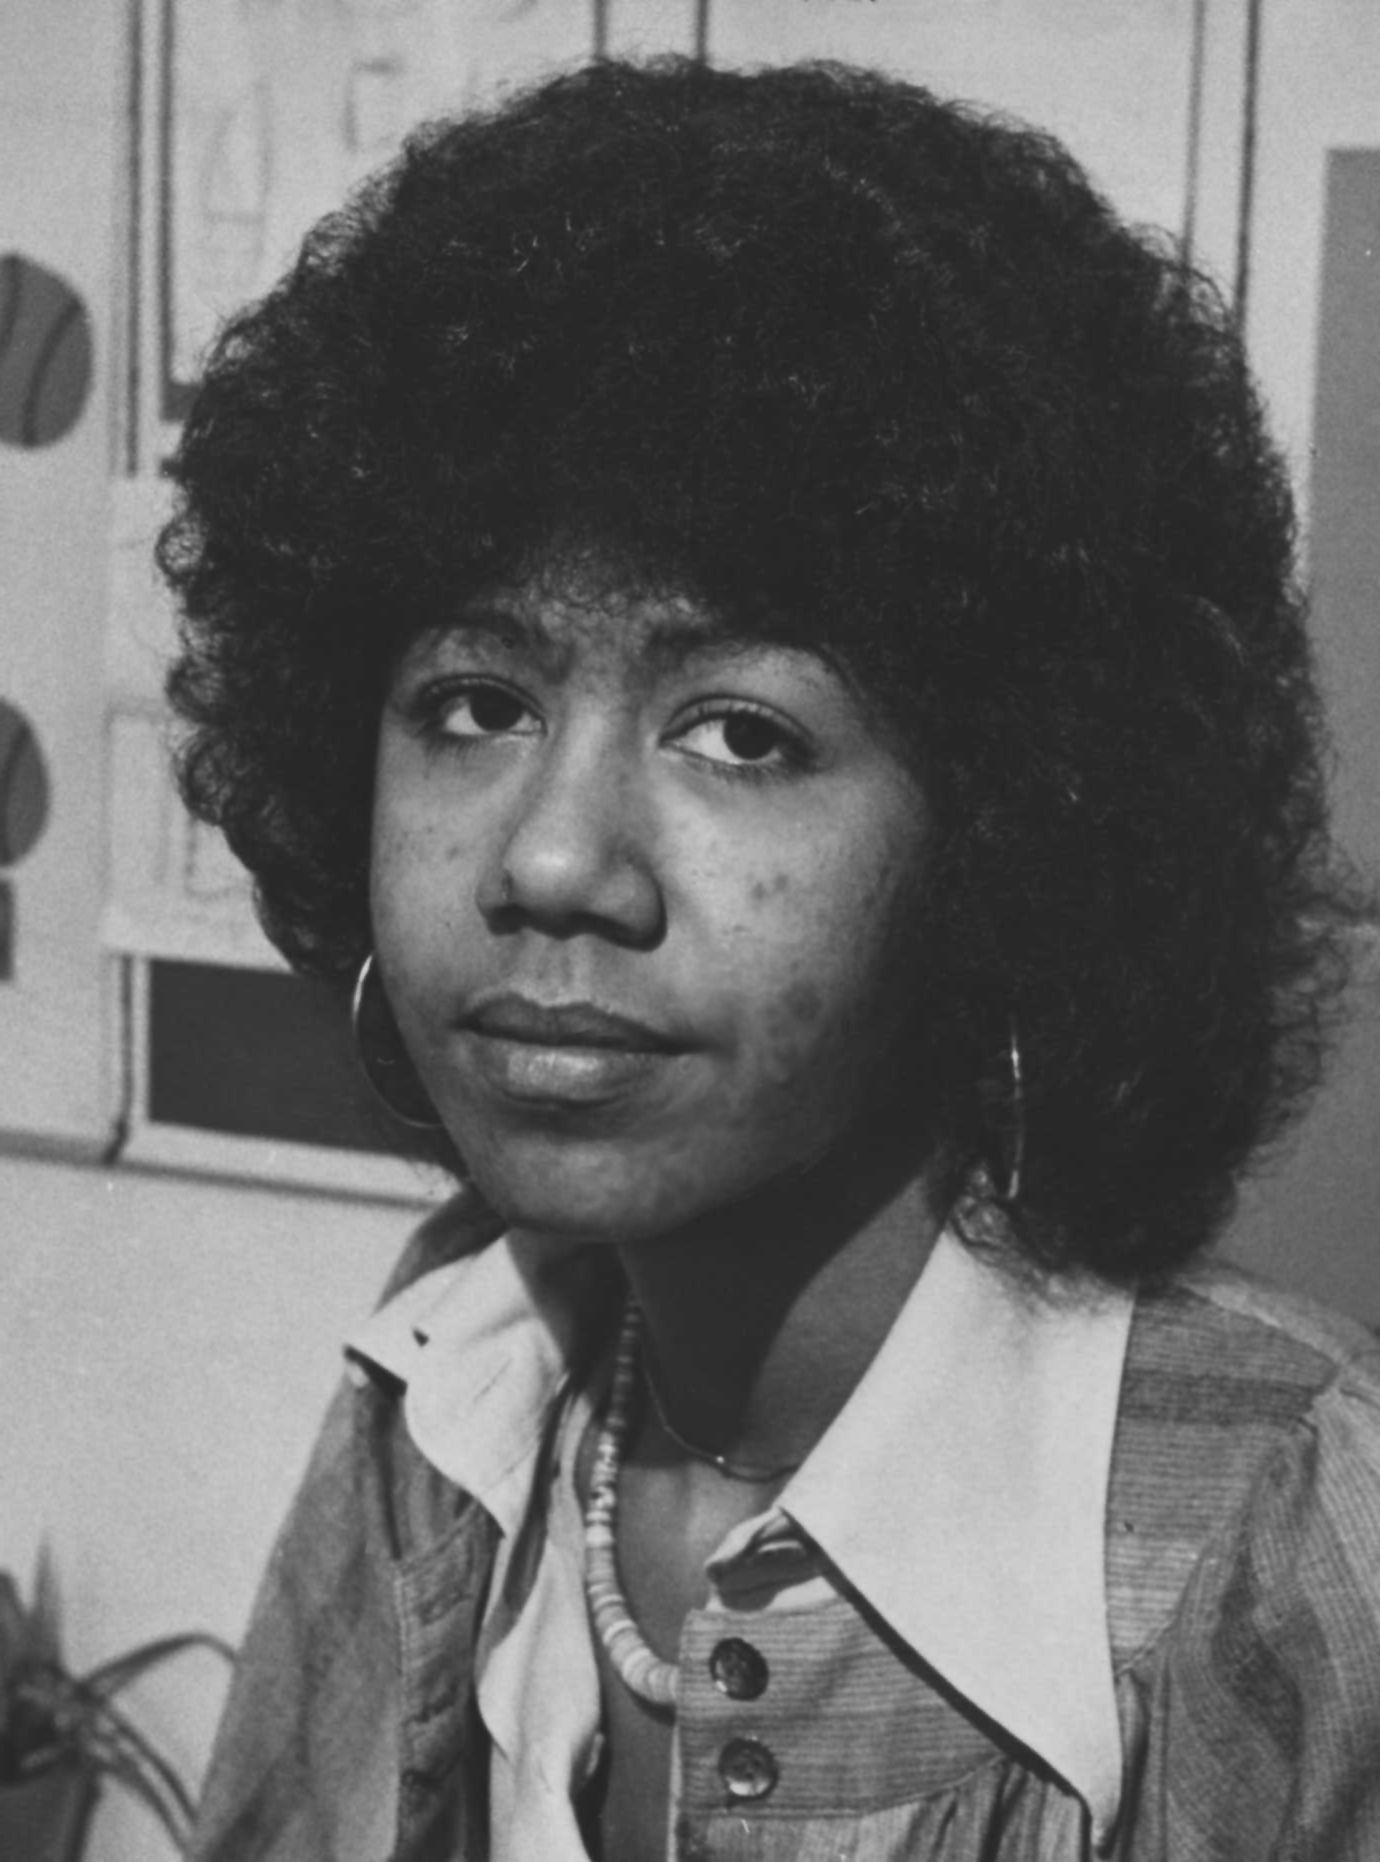 Oakland, CA December 23, 1975 - Fromer Black Panther Party member Ericka Huggins. (By Lonnie Wilson / Oakland Tribune) Published December 28, 1975